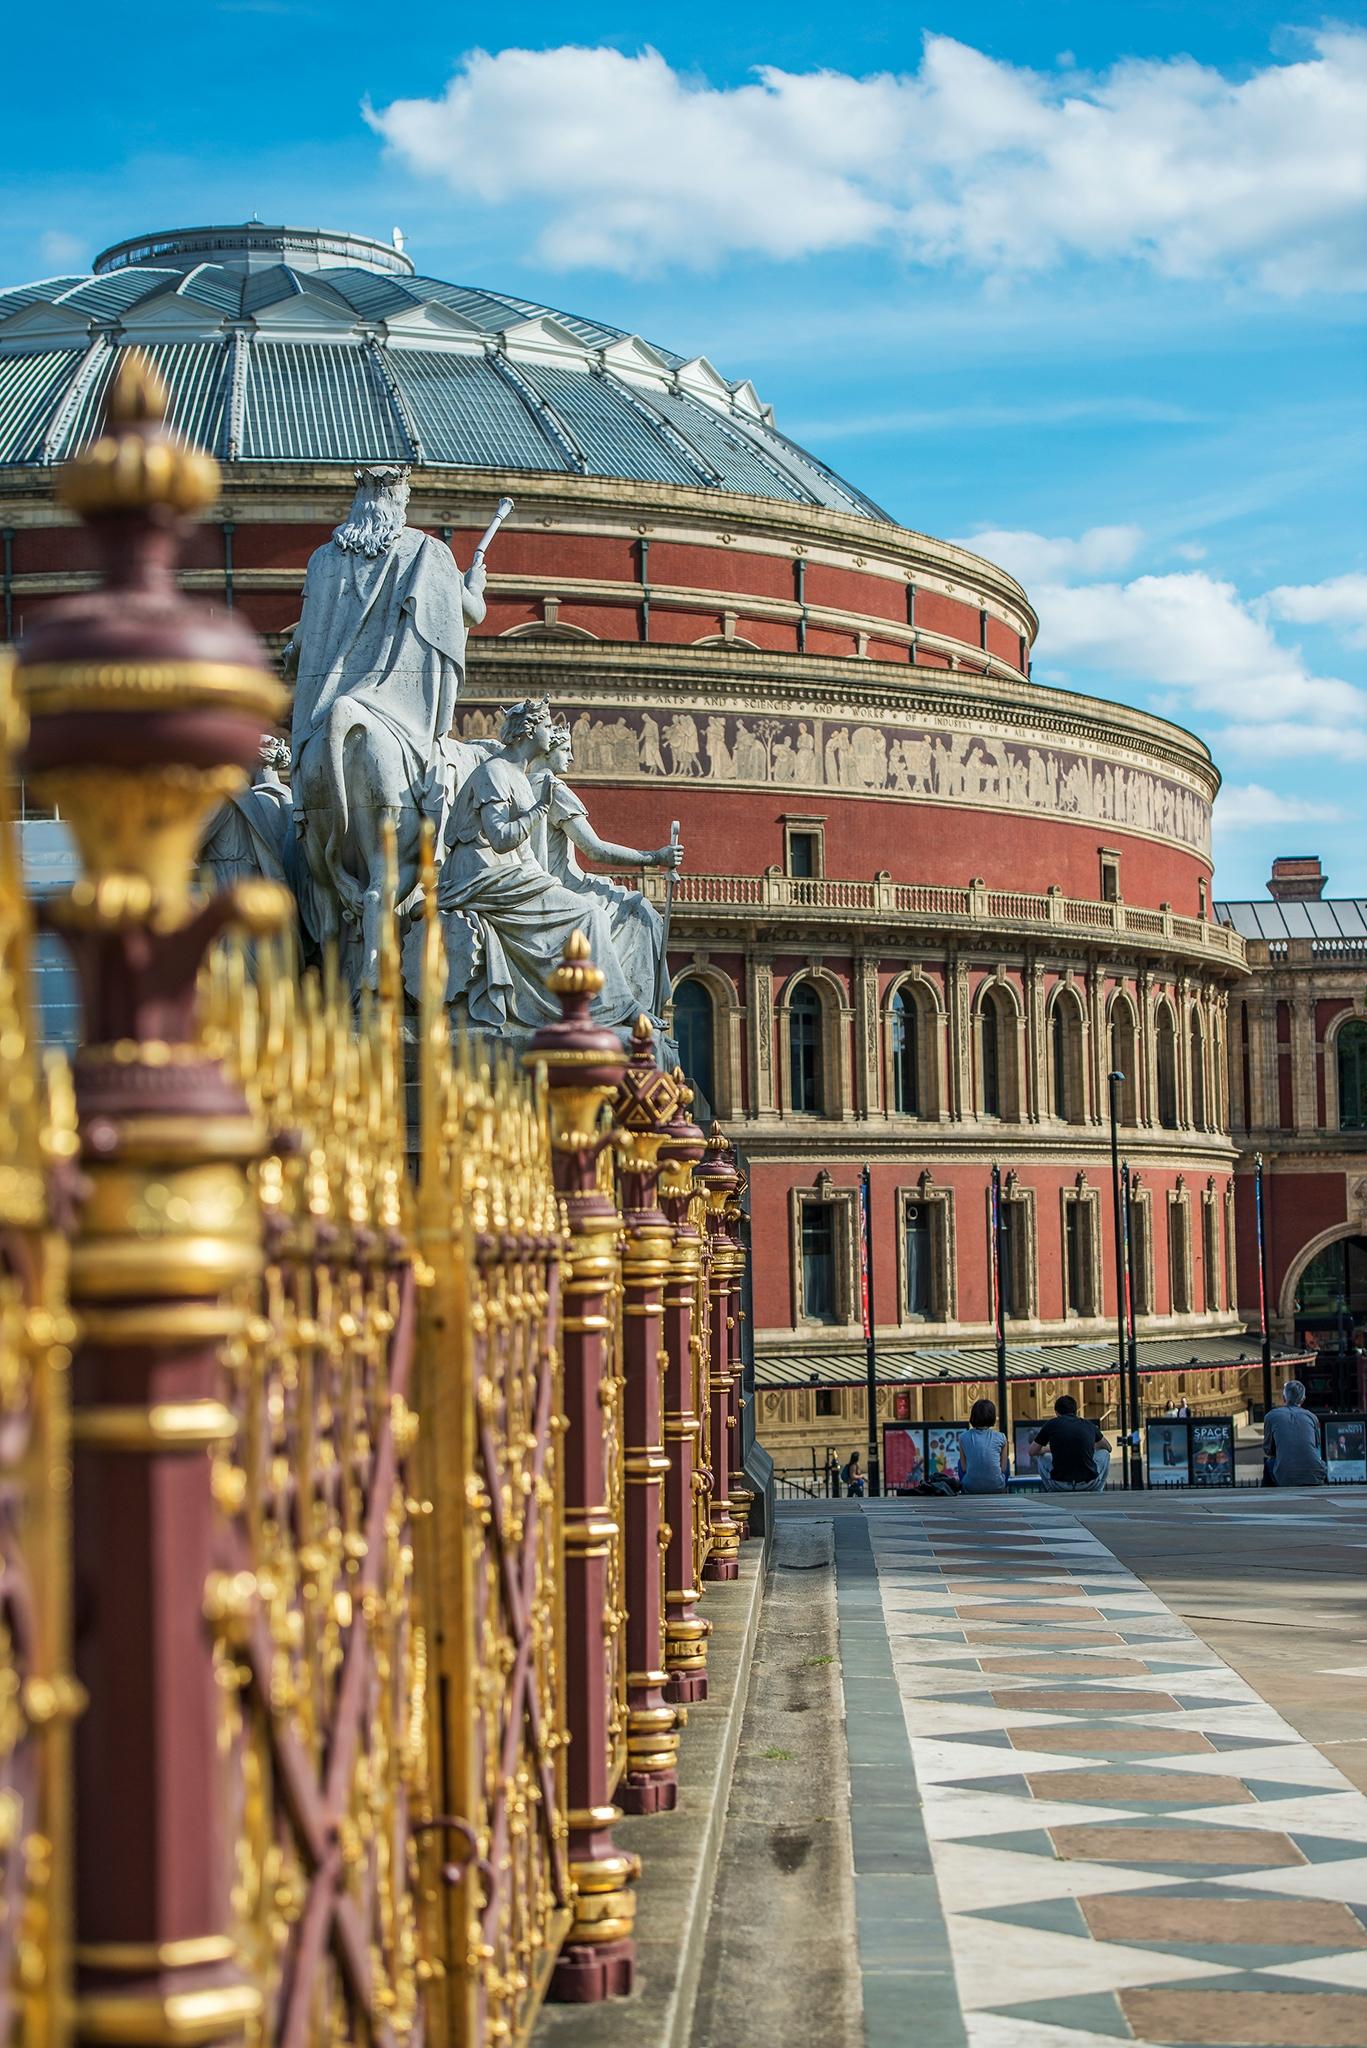 Royal Albert Hall - Nikon, D800E - toshmarshall | ello